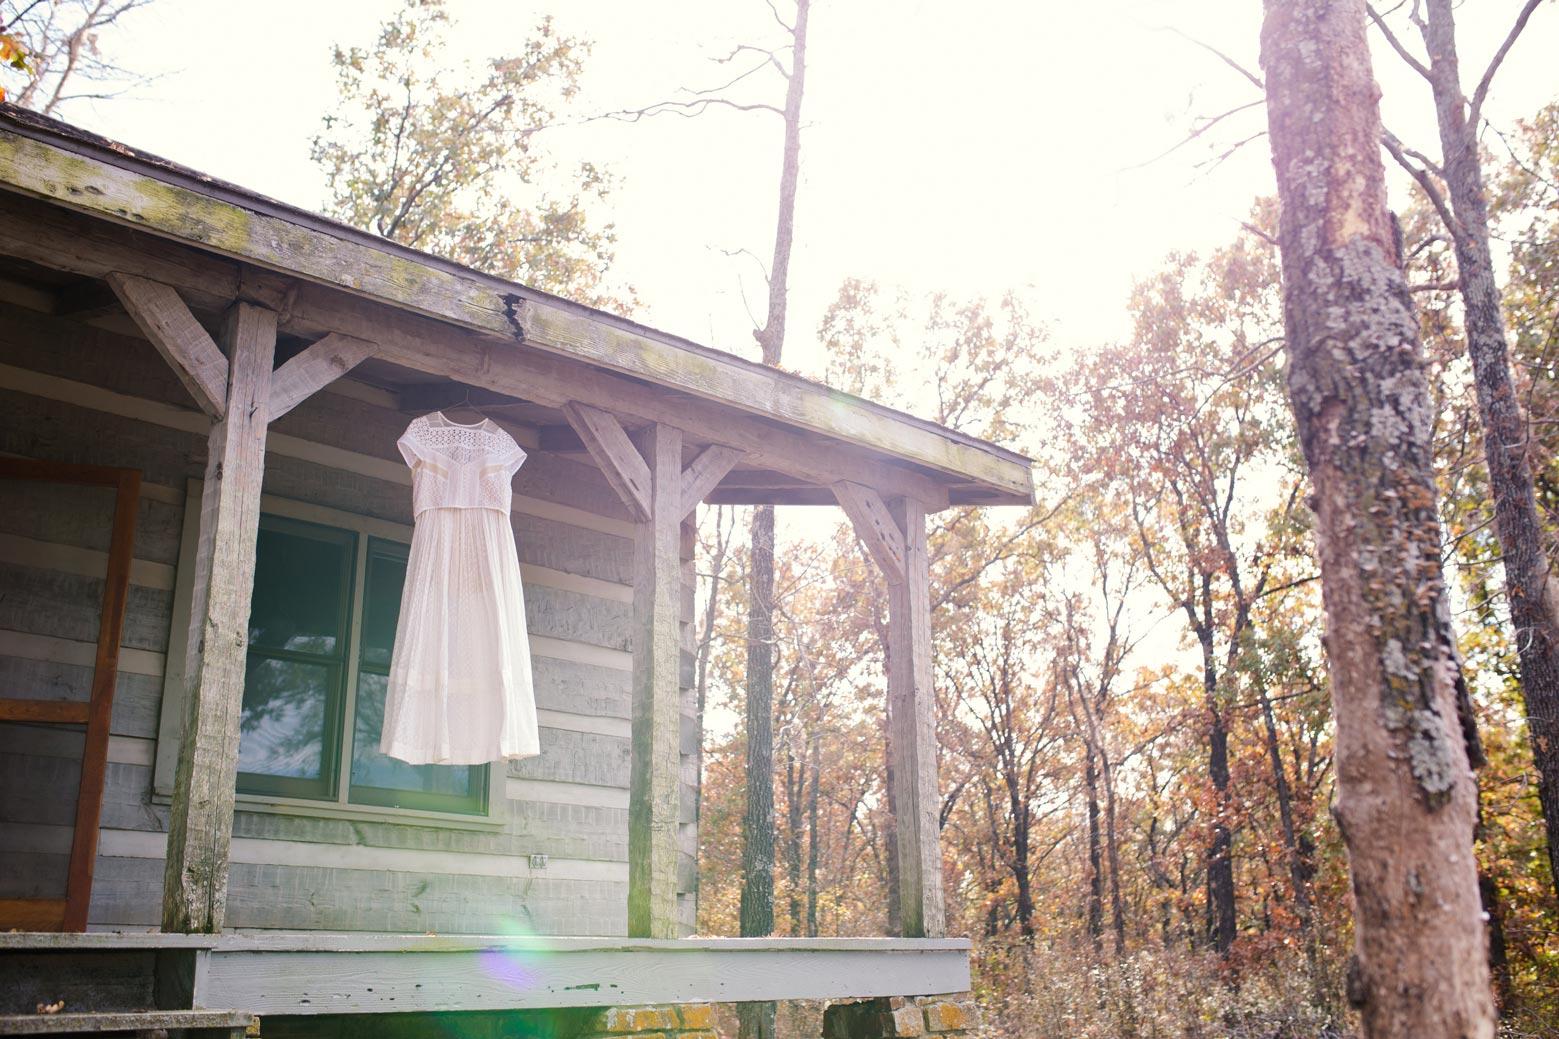 Rustic-Whimsical-Wedding- Tulsa-Wedding-FloristRobyns-Flower-Garden_Mallory-Hall-Photography01.jpg